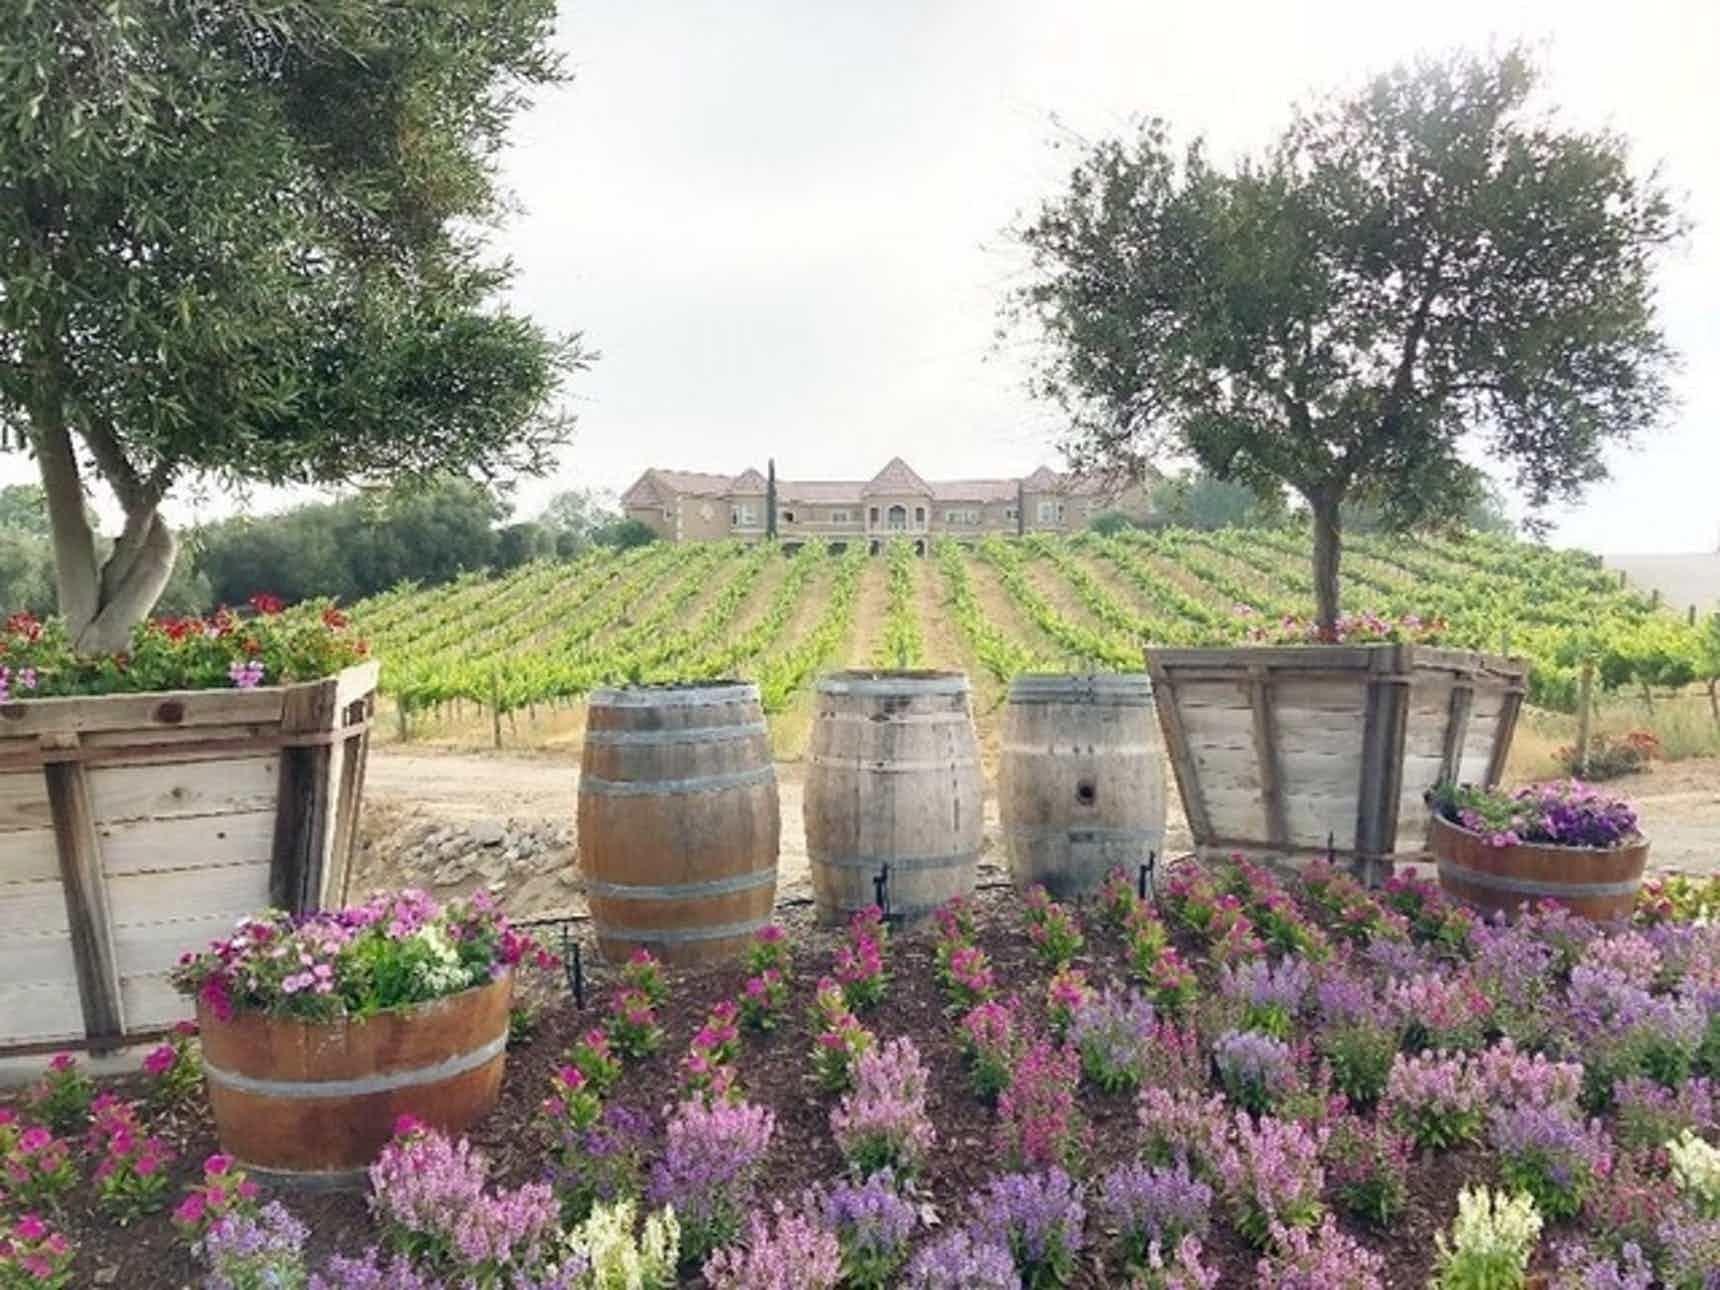 Wilson Creek Winery Wedding Venue Temecula CA 92591